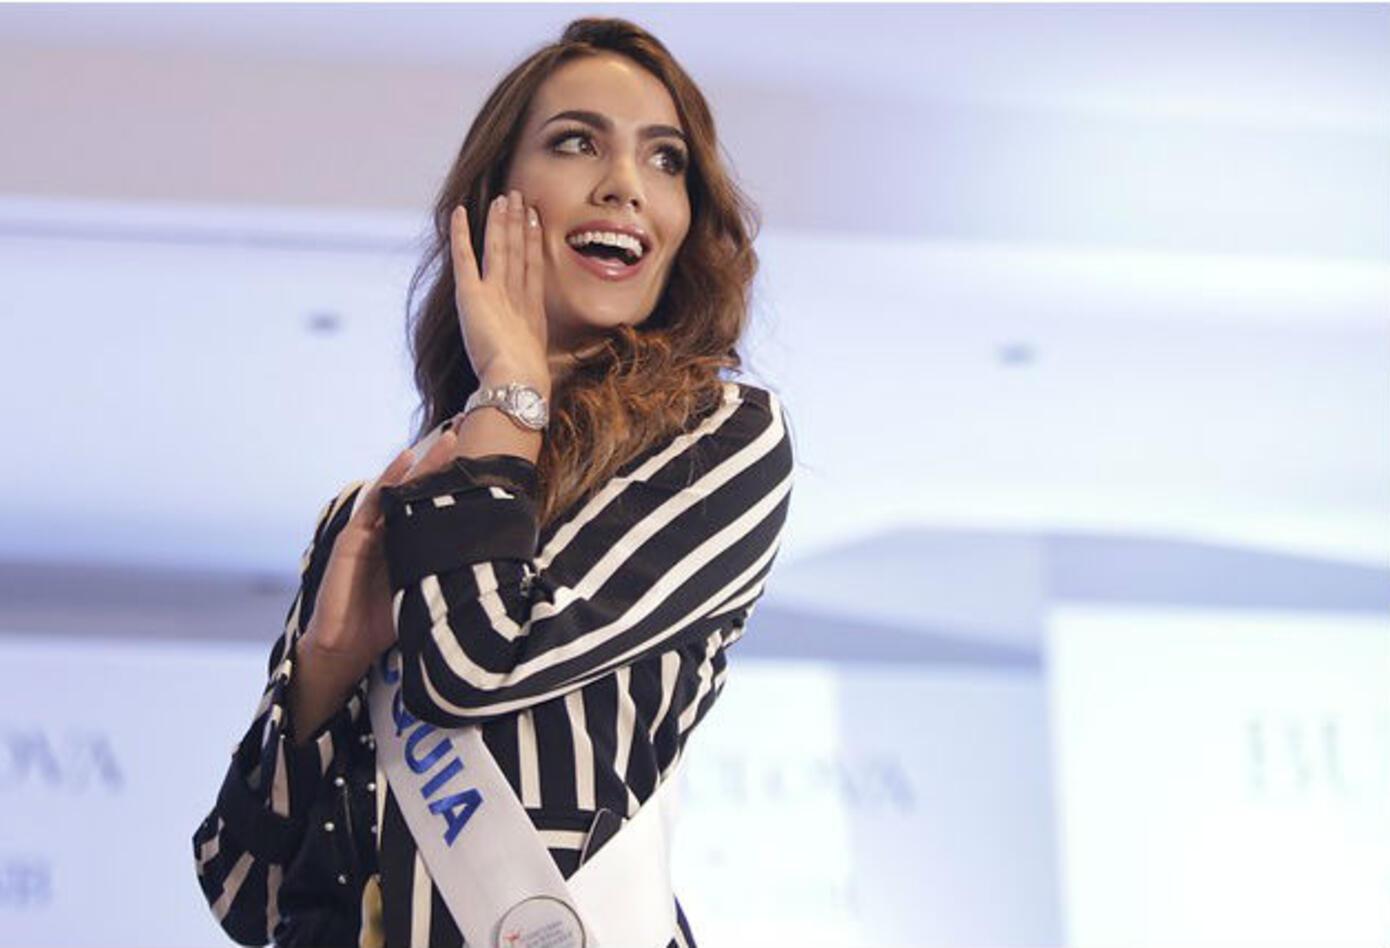 María Luisa Bula Echeverri